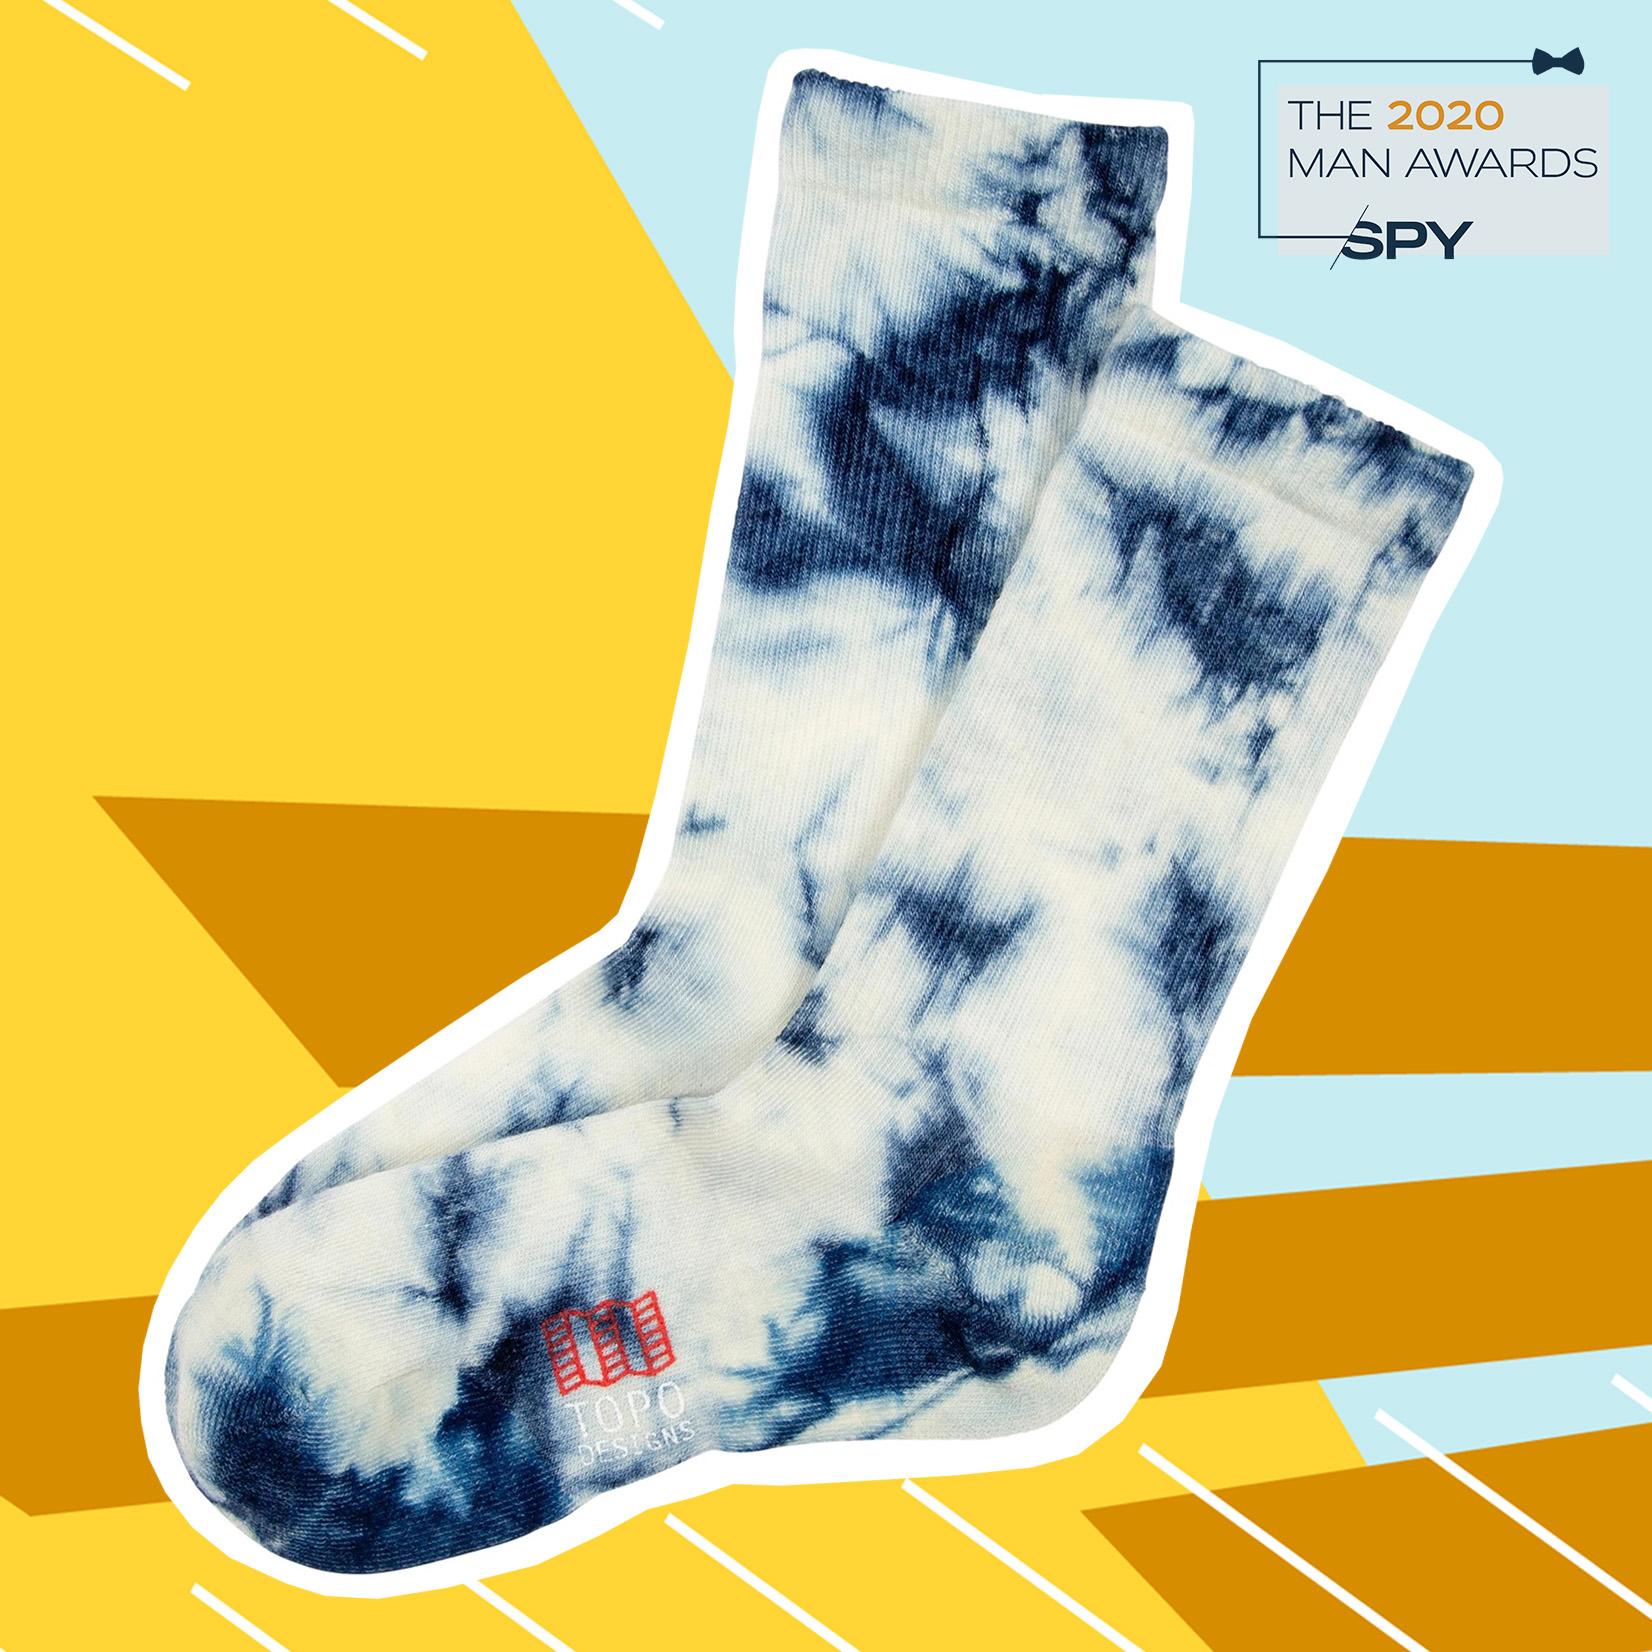 Tie-Dye Merino Socks from topo designs, best men's accessories of 2020